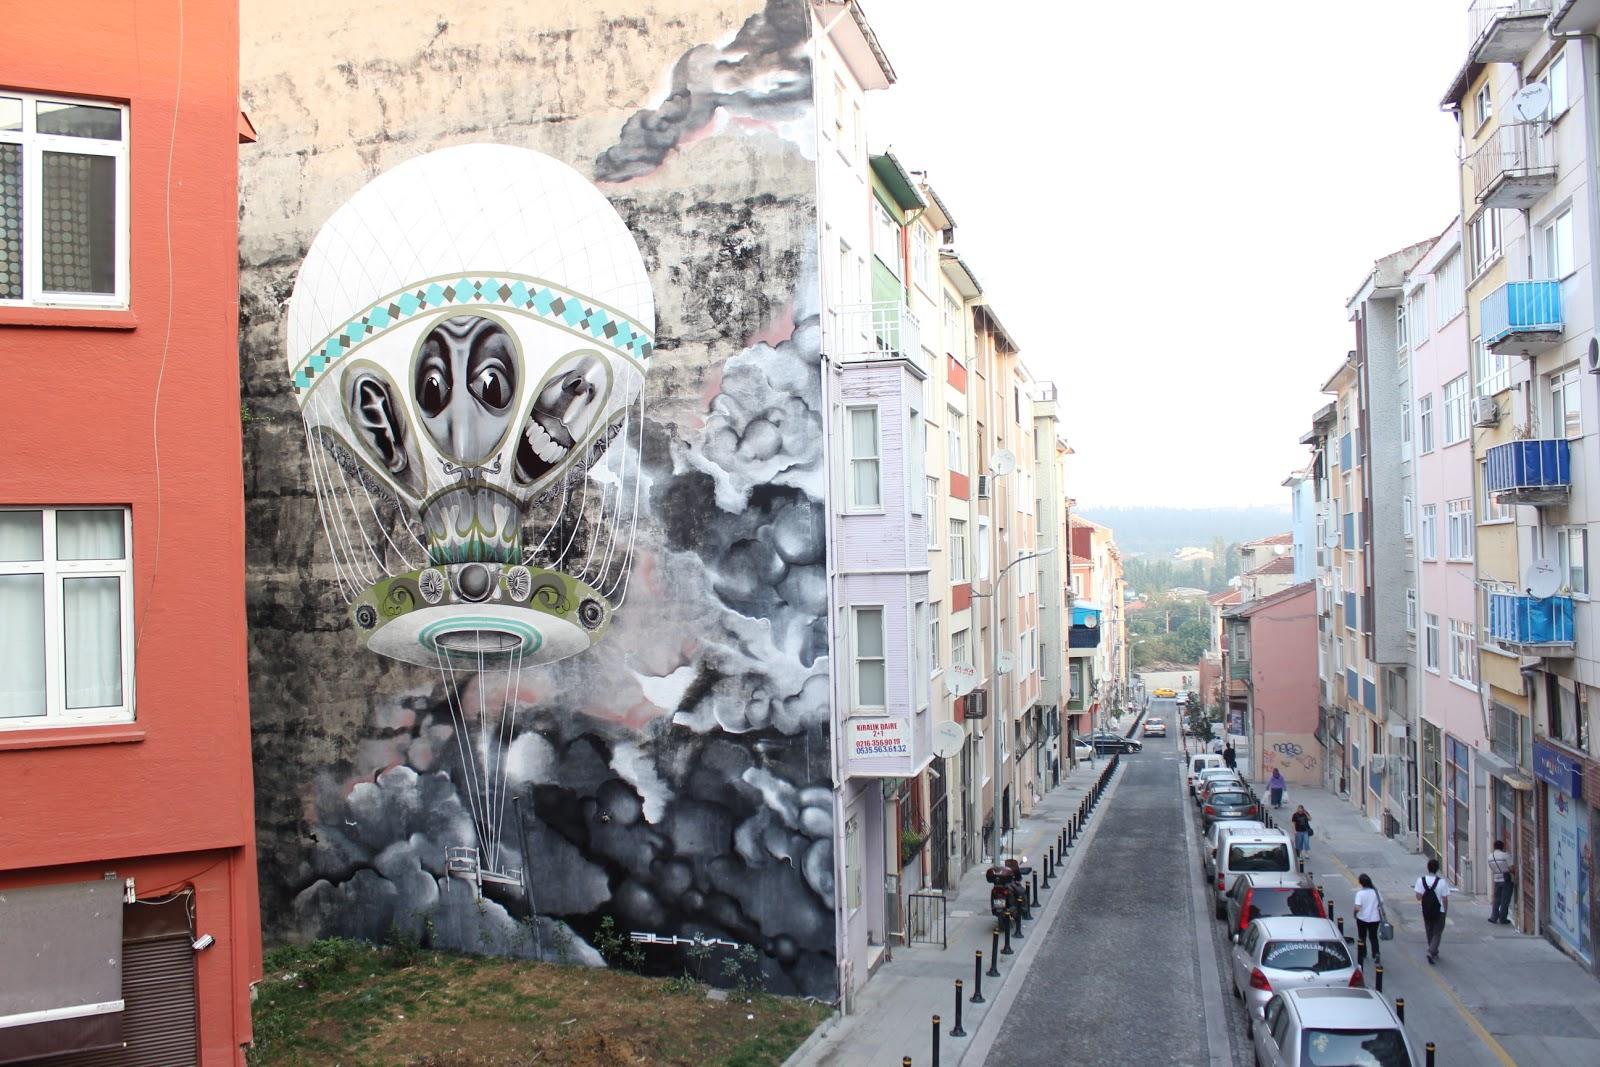 etam-cru-bezt-sainer-street-art-large-murals-16